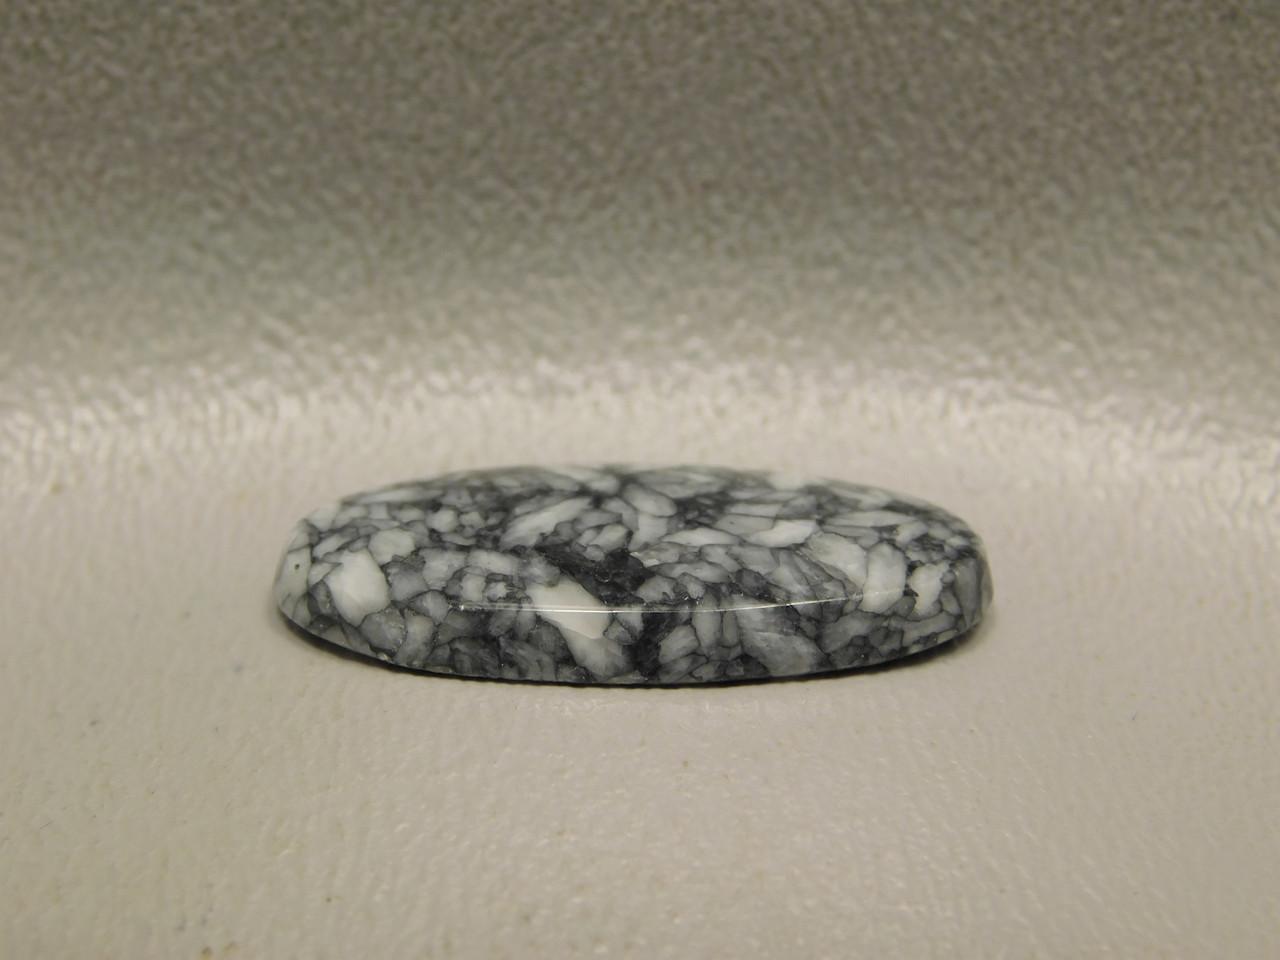 Cabochon Stone Pinolith or Pinolite Austria Gemstone #20